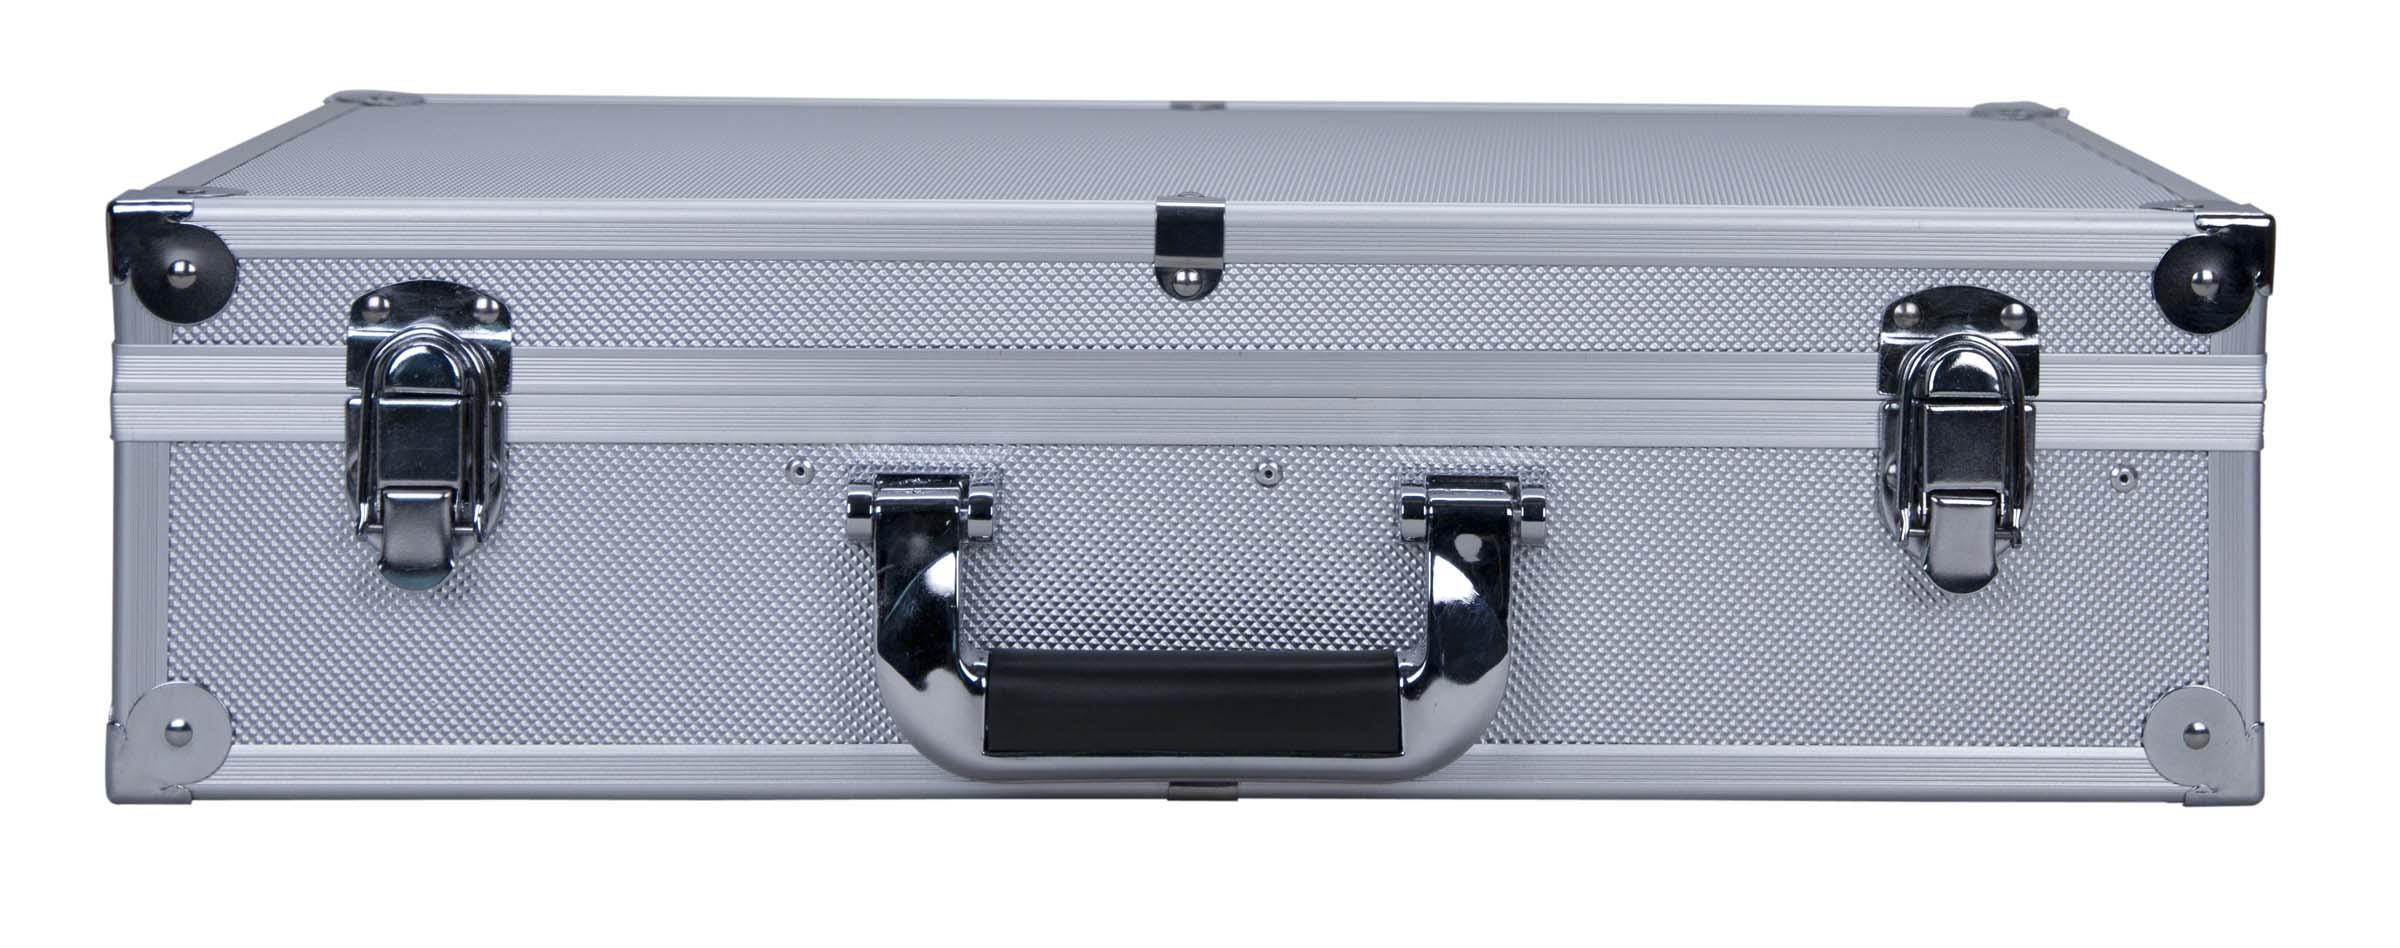 Global Specialties PB-503C Portable Analog & Digital Design Trainer Photo